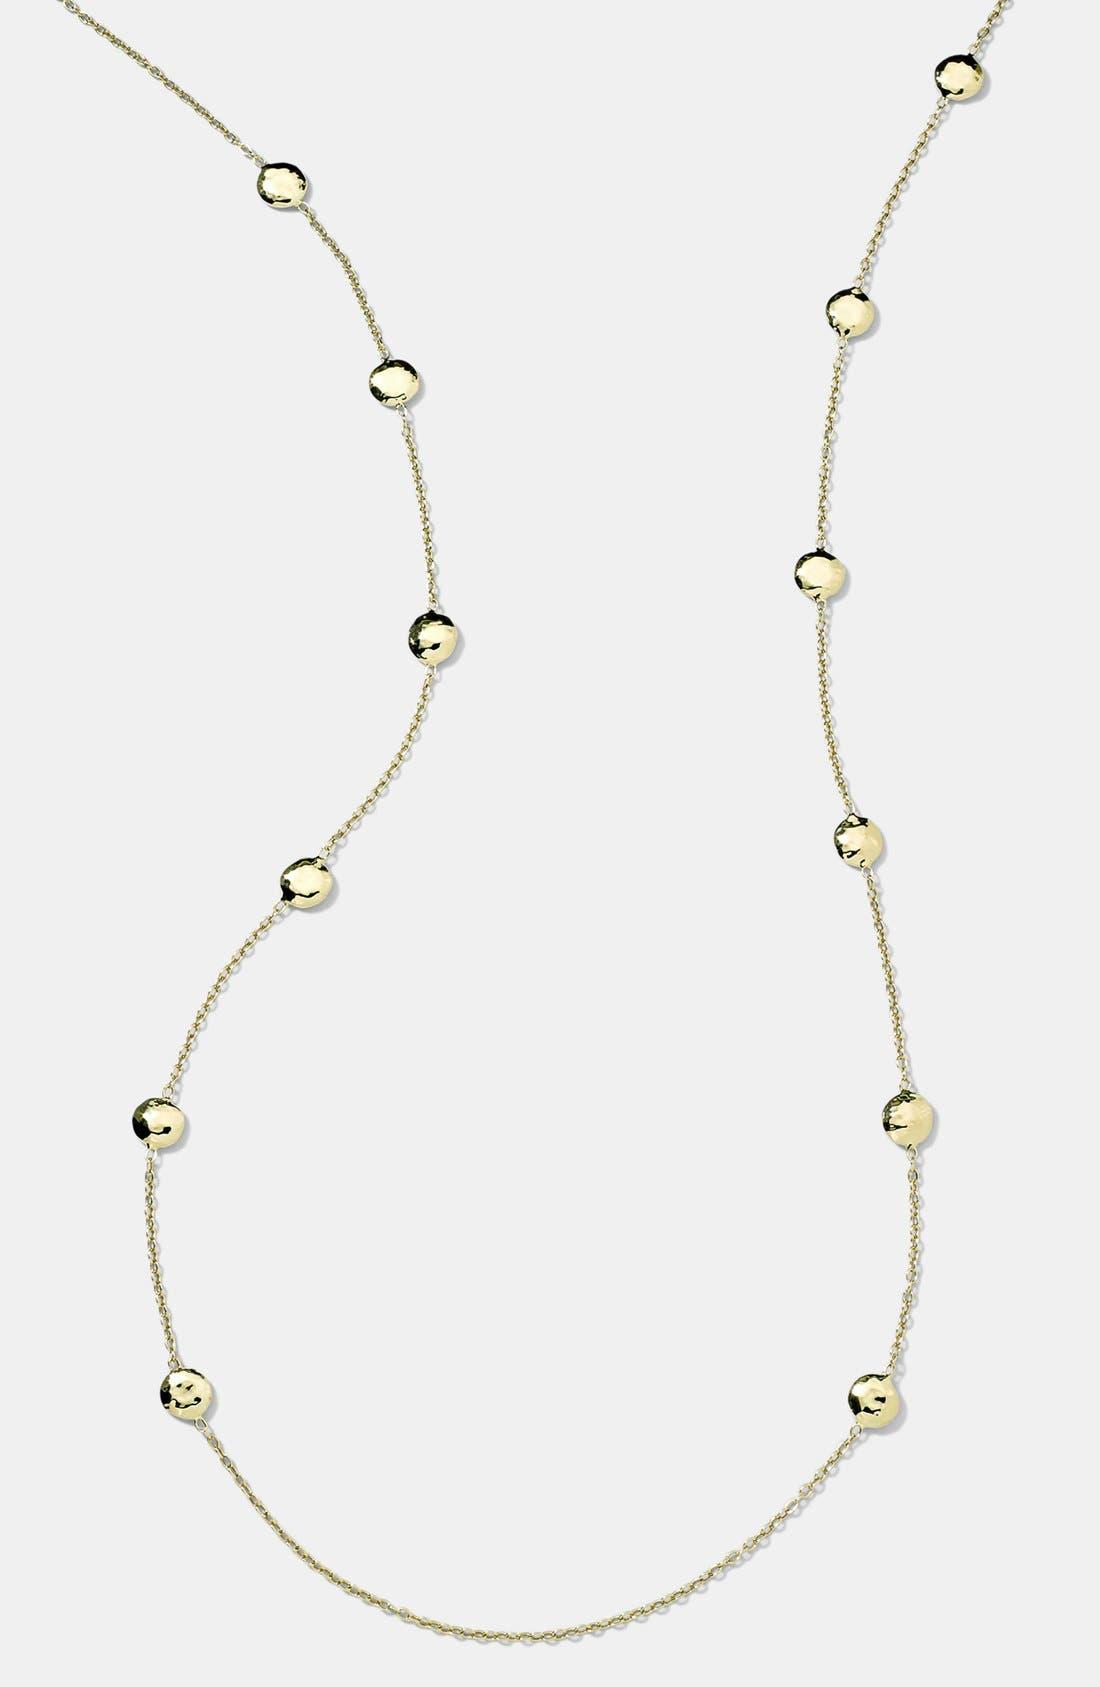 Alternate Image 1 Selected - Ippolita 'Glamazon - Pinball' 18k Gold Long Station Necklace